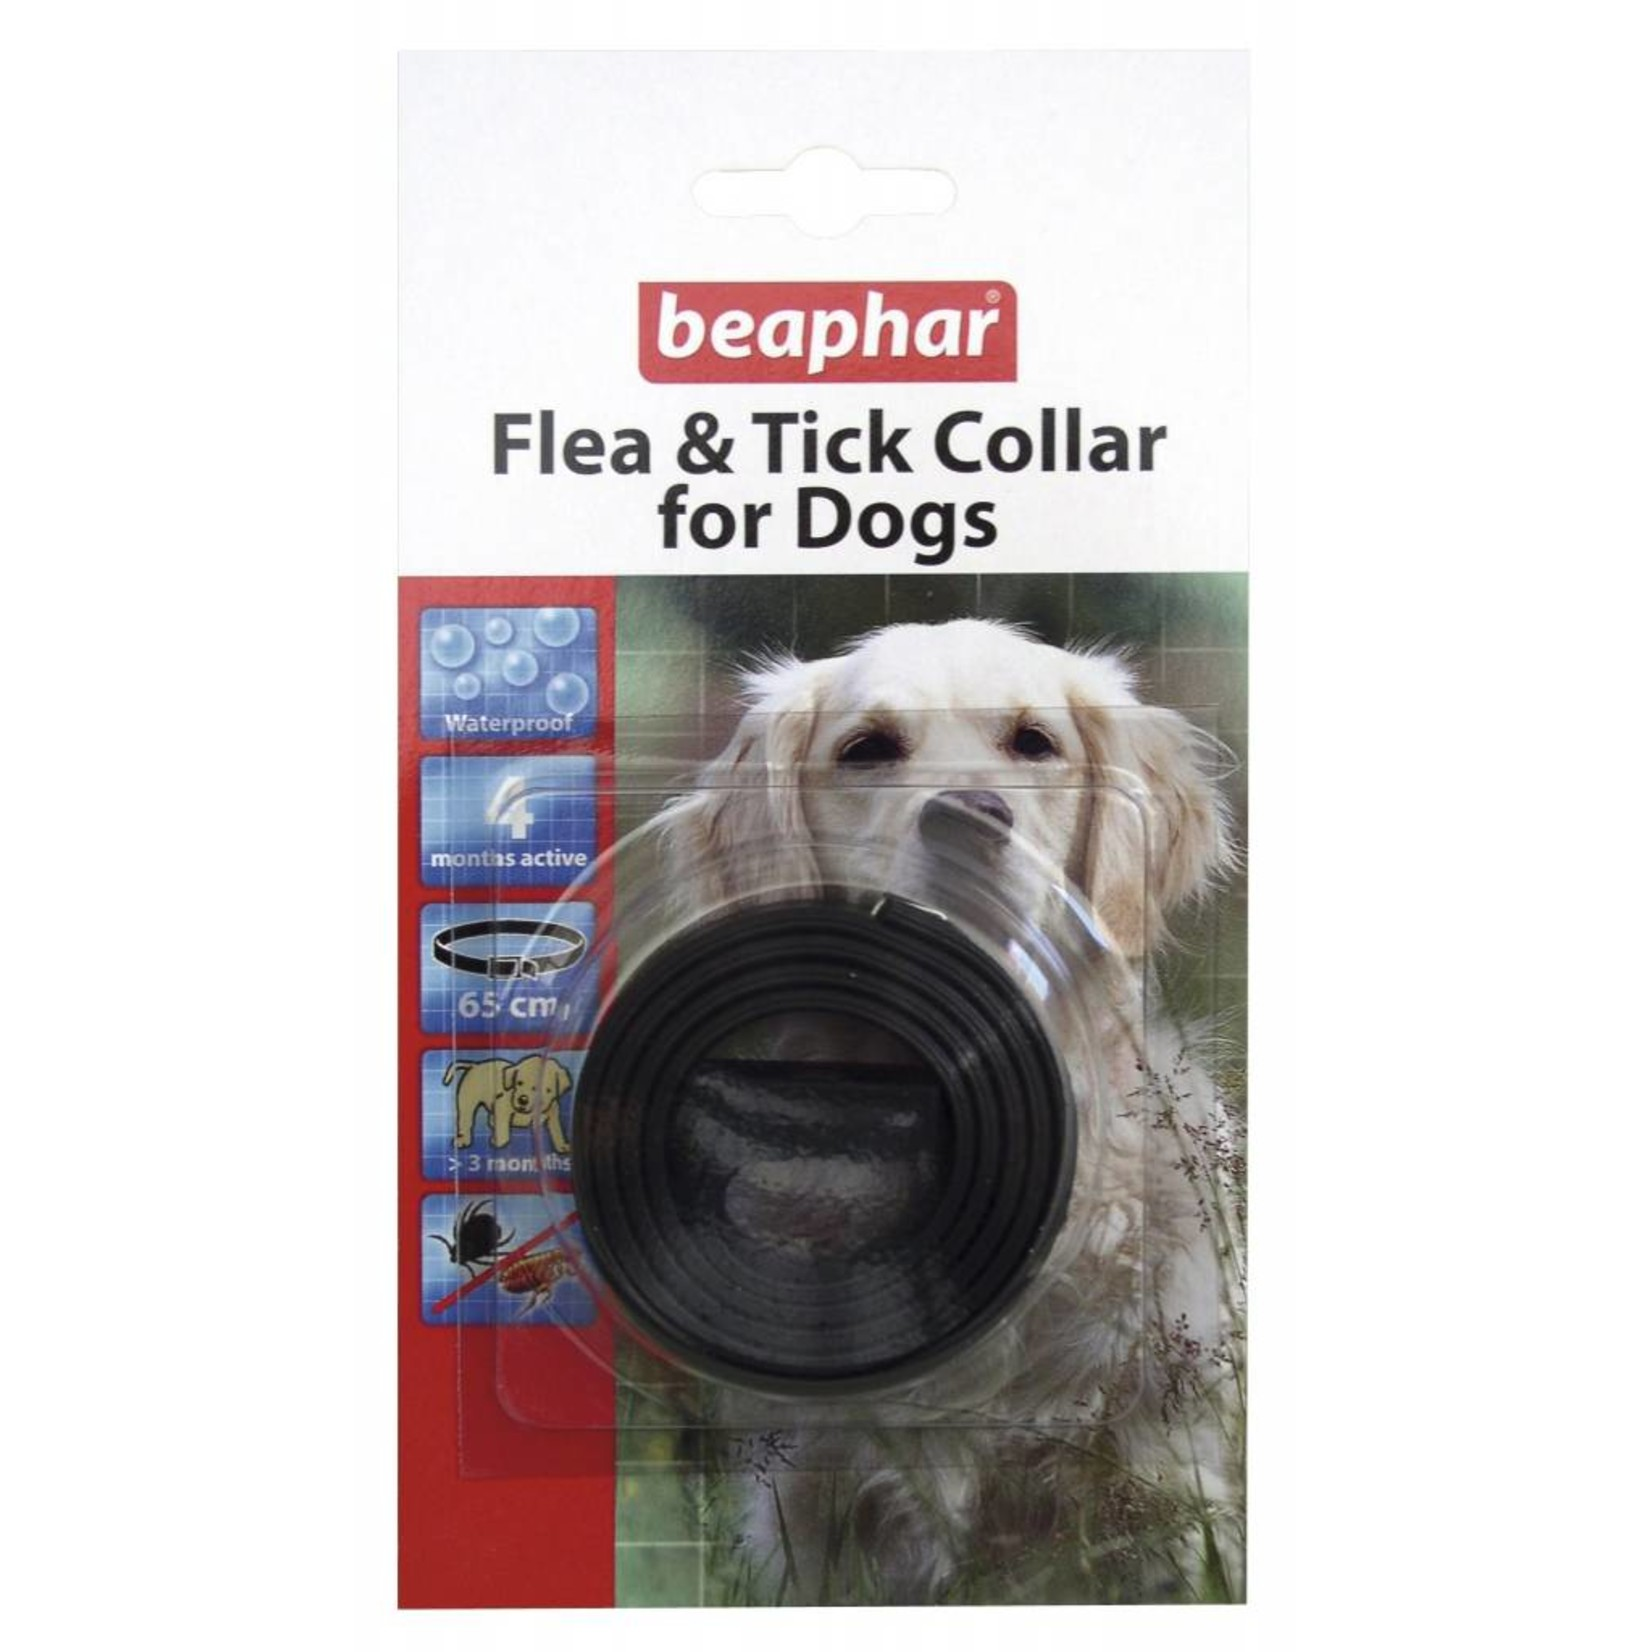 Beaphar Dog Plastic Flea & Tick Collar - Mixed 60cm